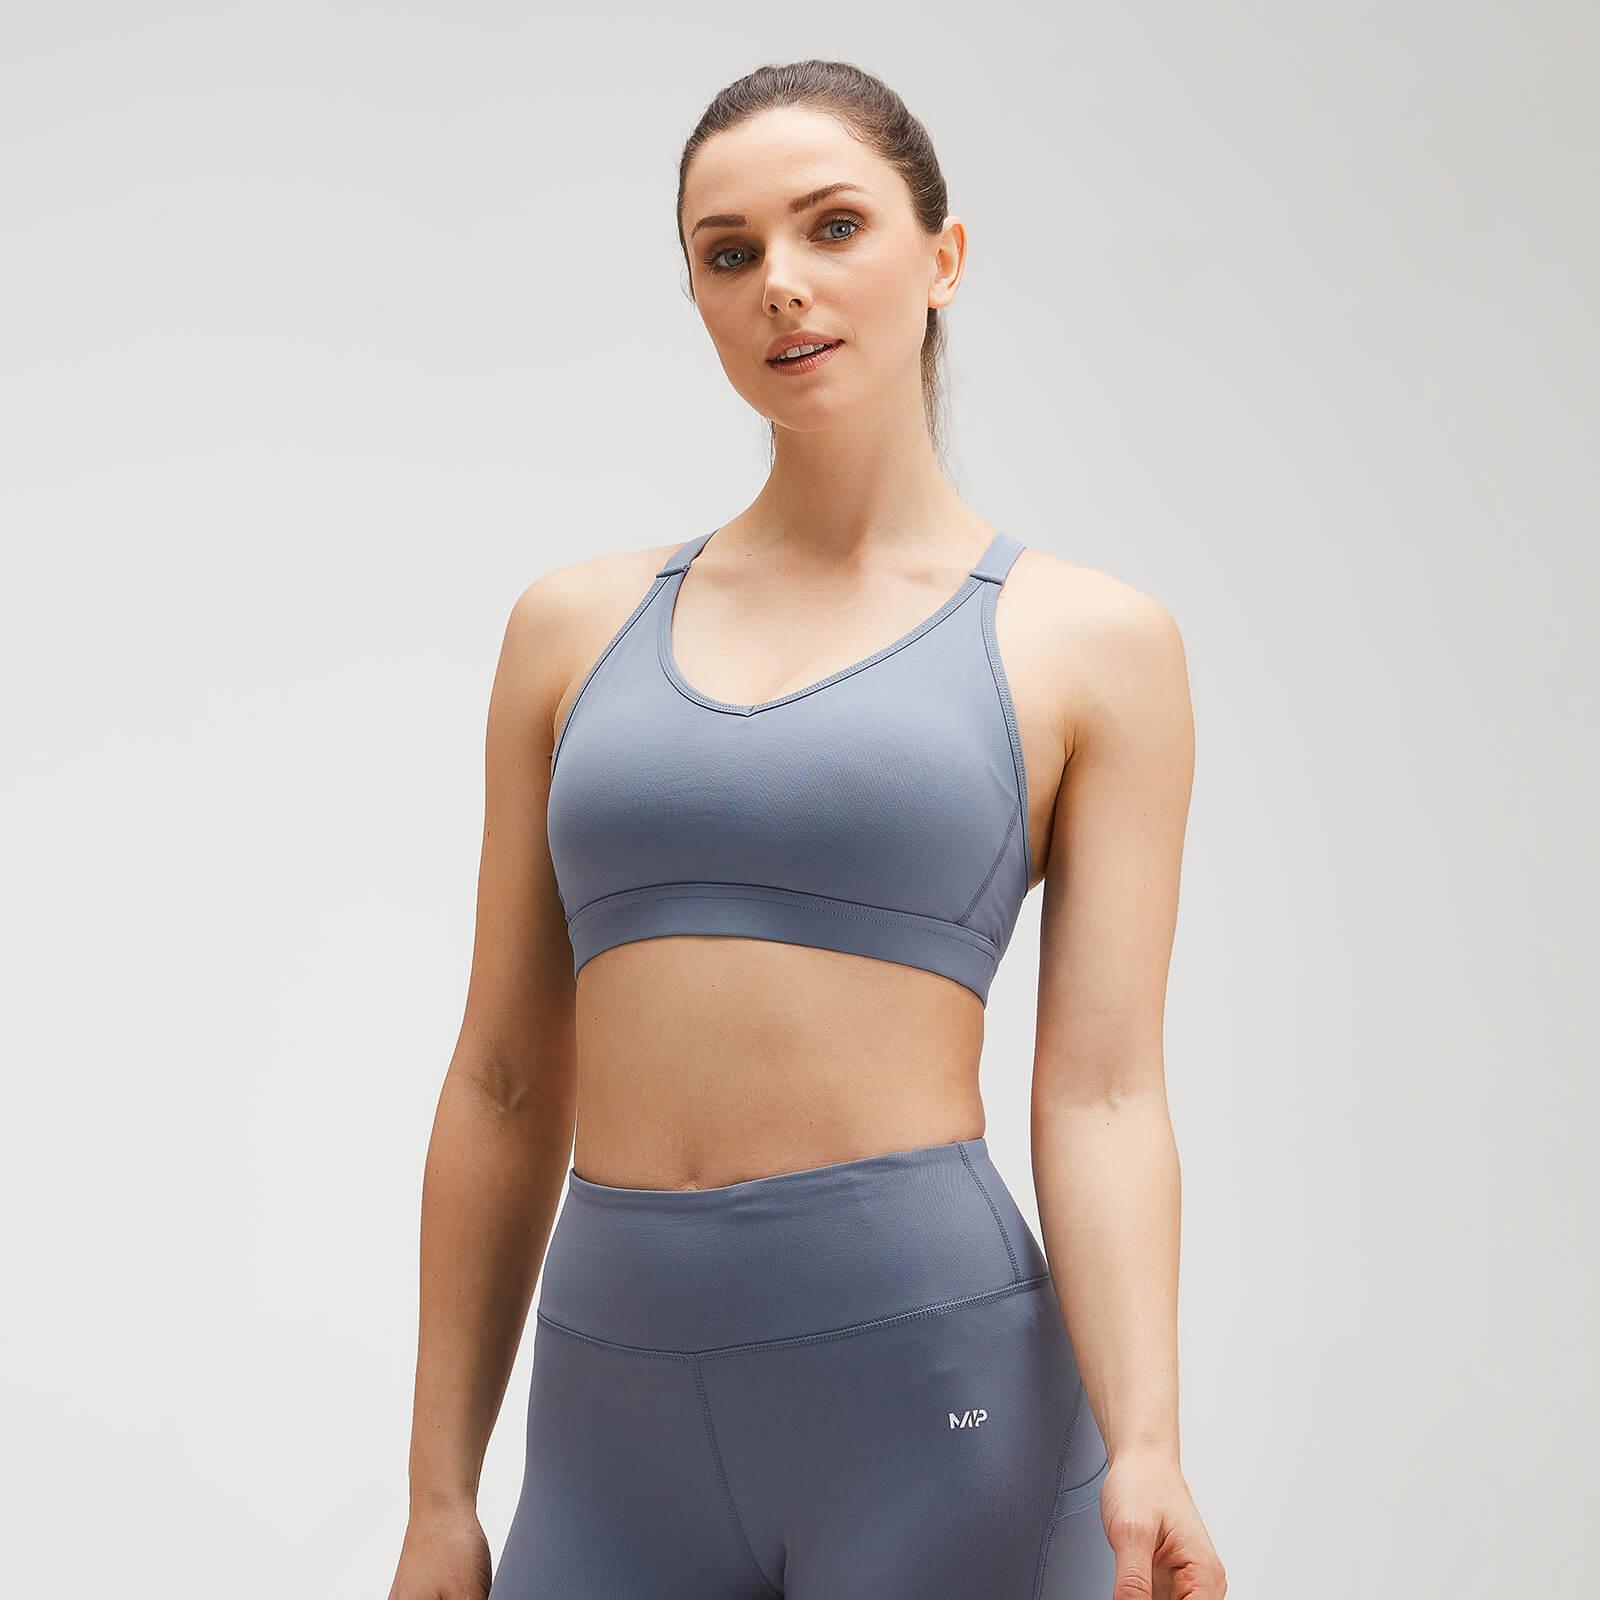 Купить MP Women's Power Mesh Sports Bra - Galaxy - XXS, Myprotein International